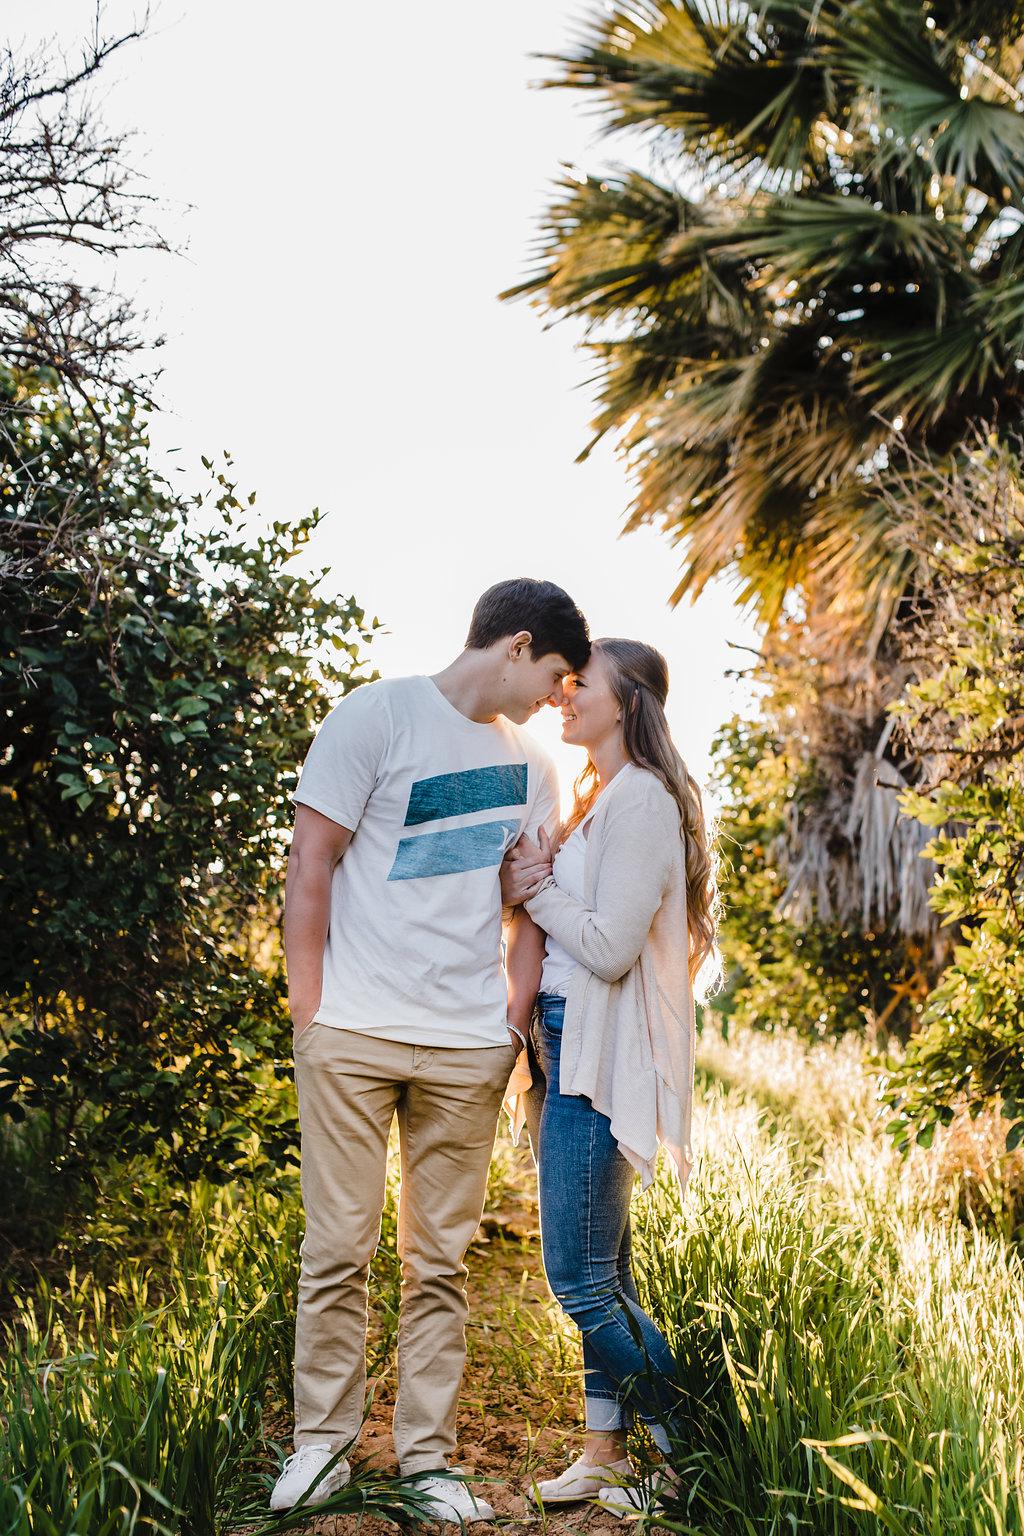 natural romantic engagement photography logan utah cache valley ut